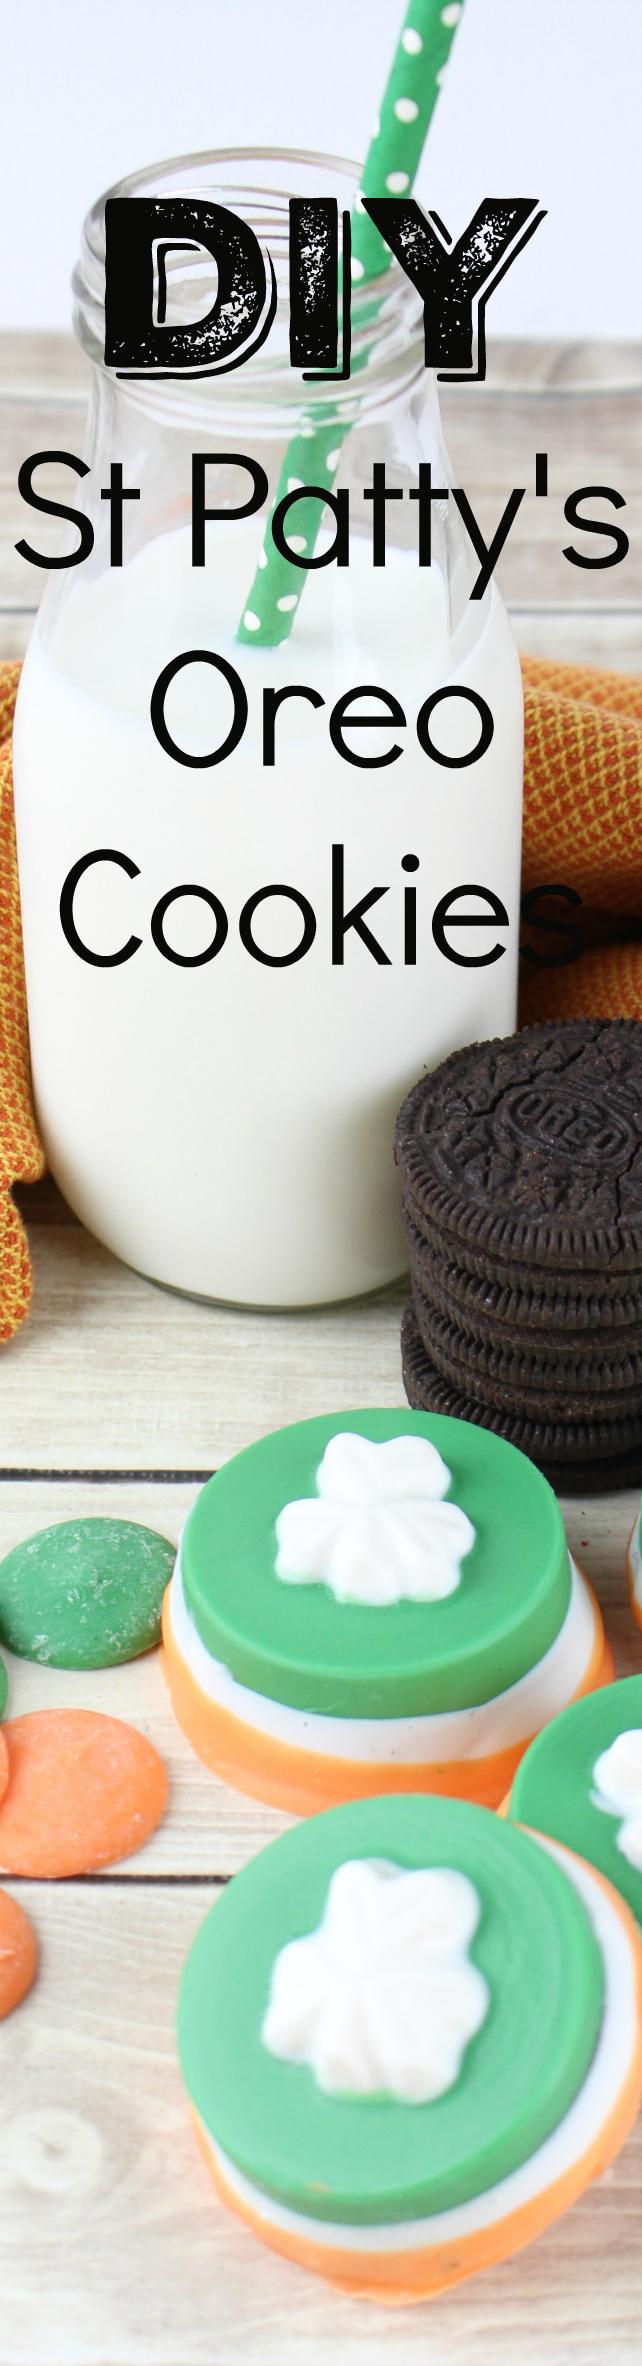 St Patrick's Day Oreo Cookies